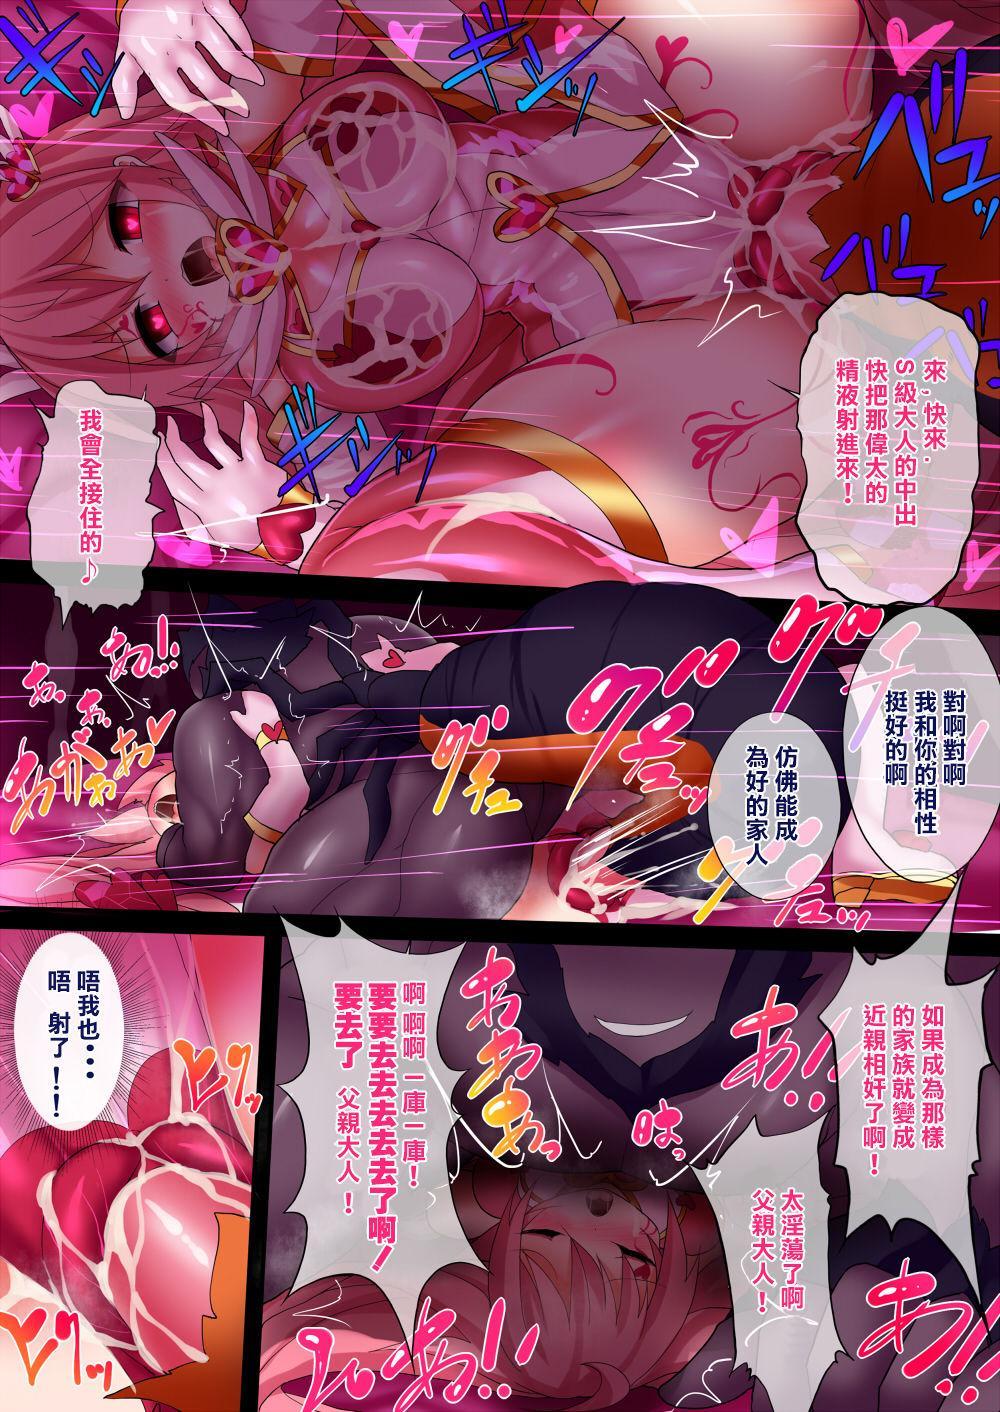 [Makutsutei (Nagai Wataru)] Orgasm Unit EX -Mahou Senshi Akari Ch. 1-5 [Chinese] [这很恶堕 x Lolipoi汉化组] 118